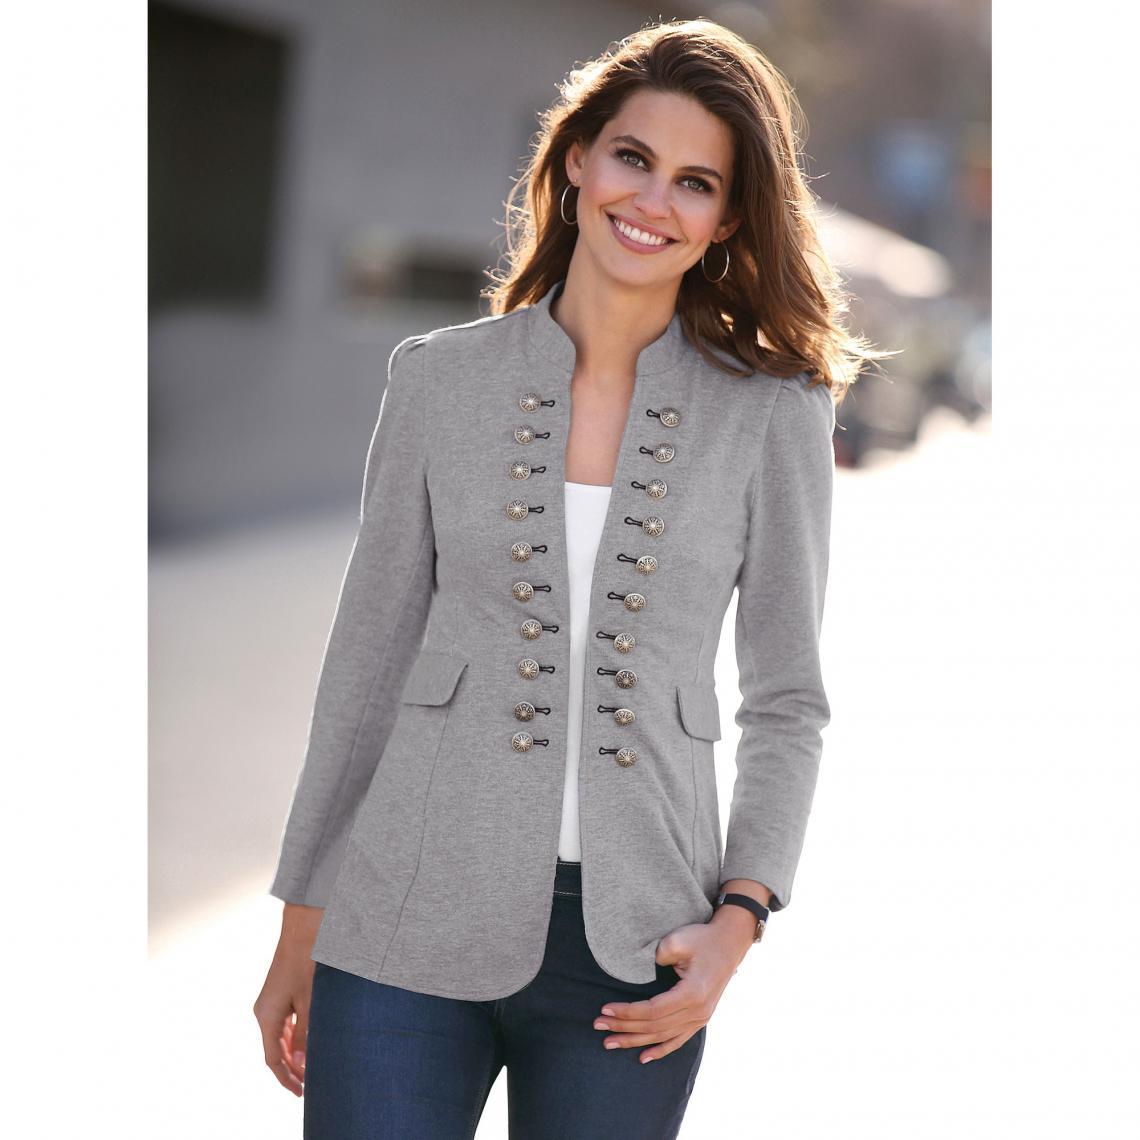 Veste femme coton col mao